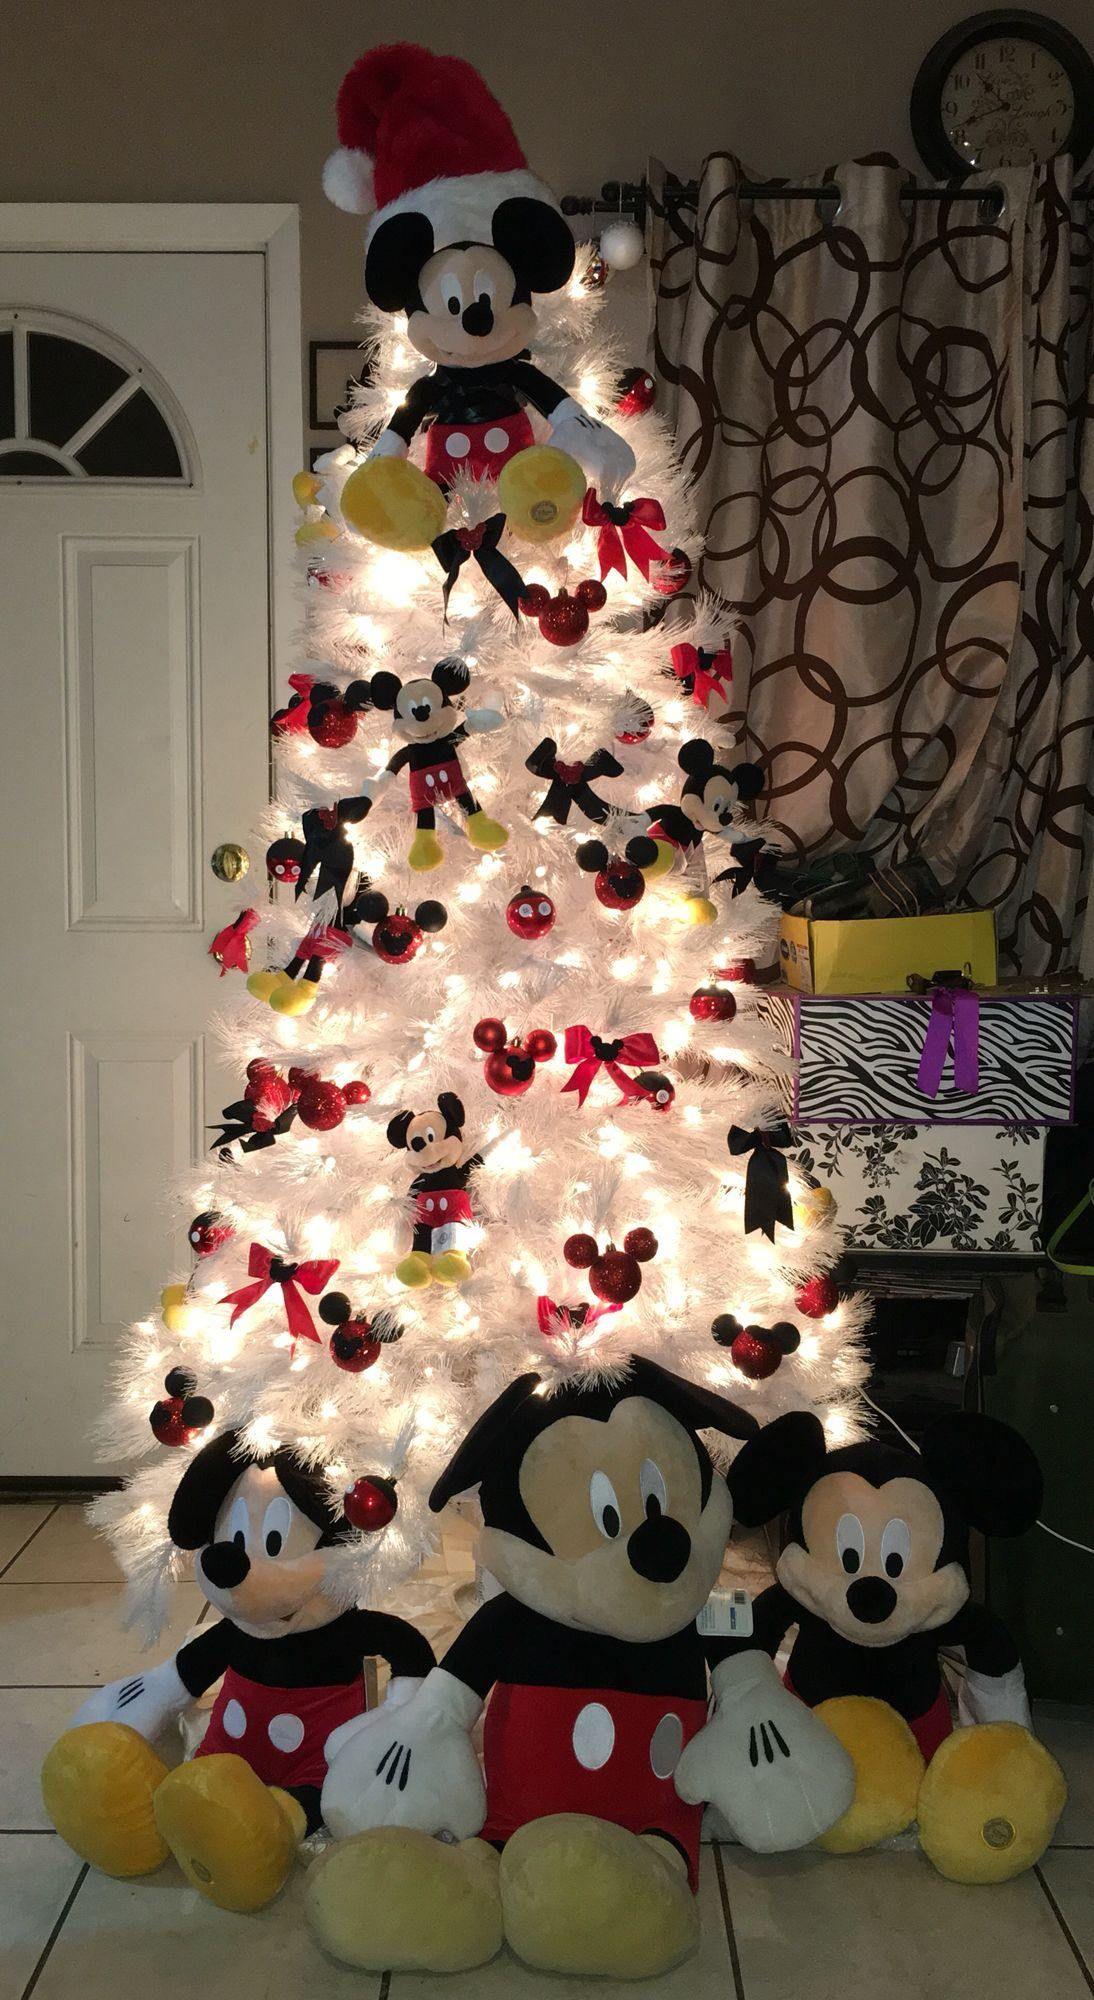 Christmas Decorations Tumblr Luxury Mickey Mouse Christmas Tree Diy Craft Pinter Mickey Mouse Christmas Tree Disney Christmas Tree Disney Christmas Decorations